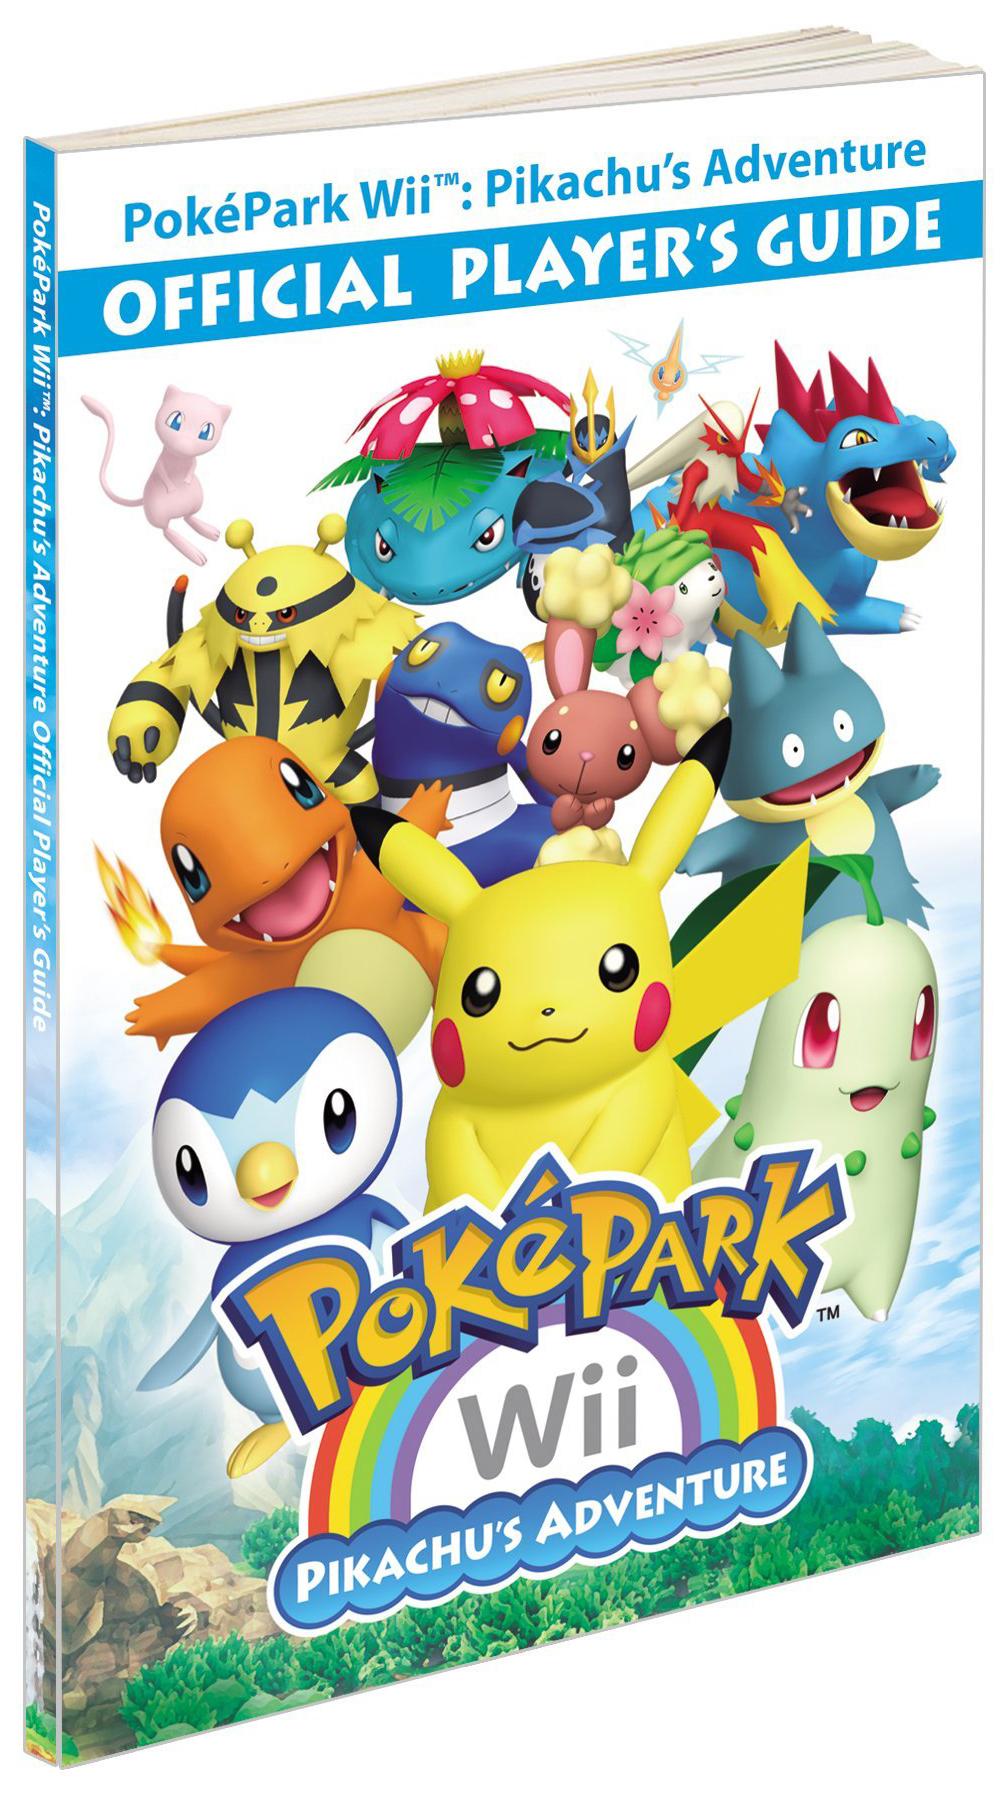 PokePark Wii: Pikachu's Adventure Guide